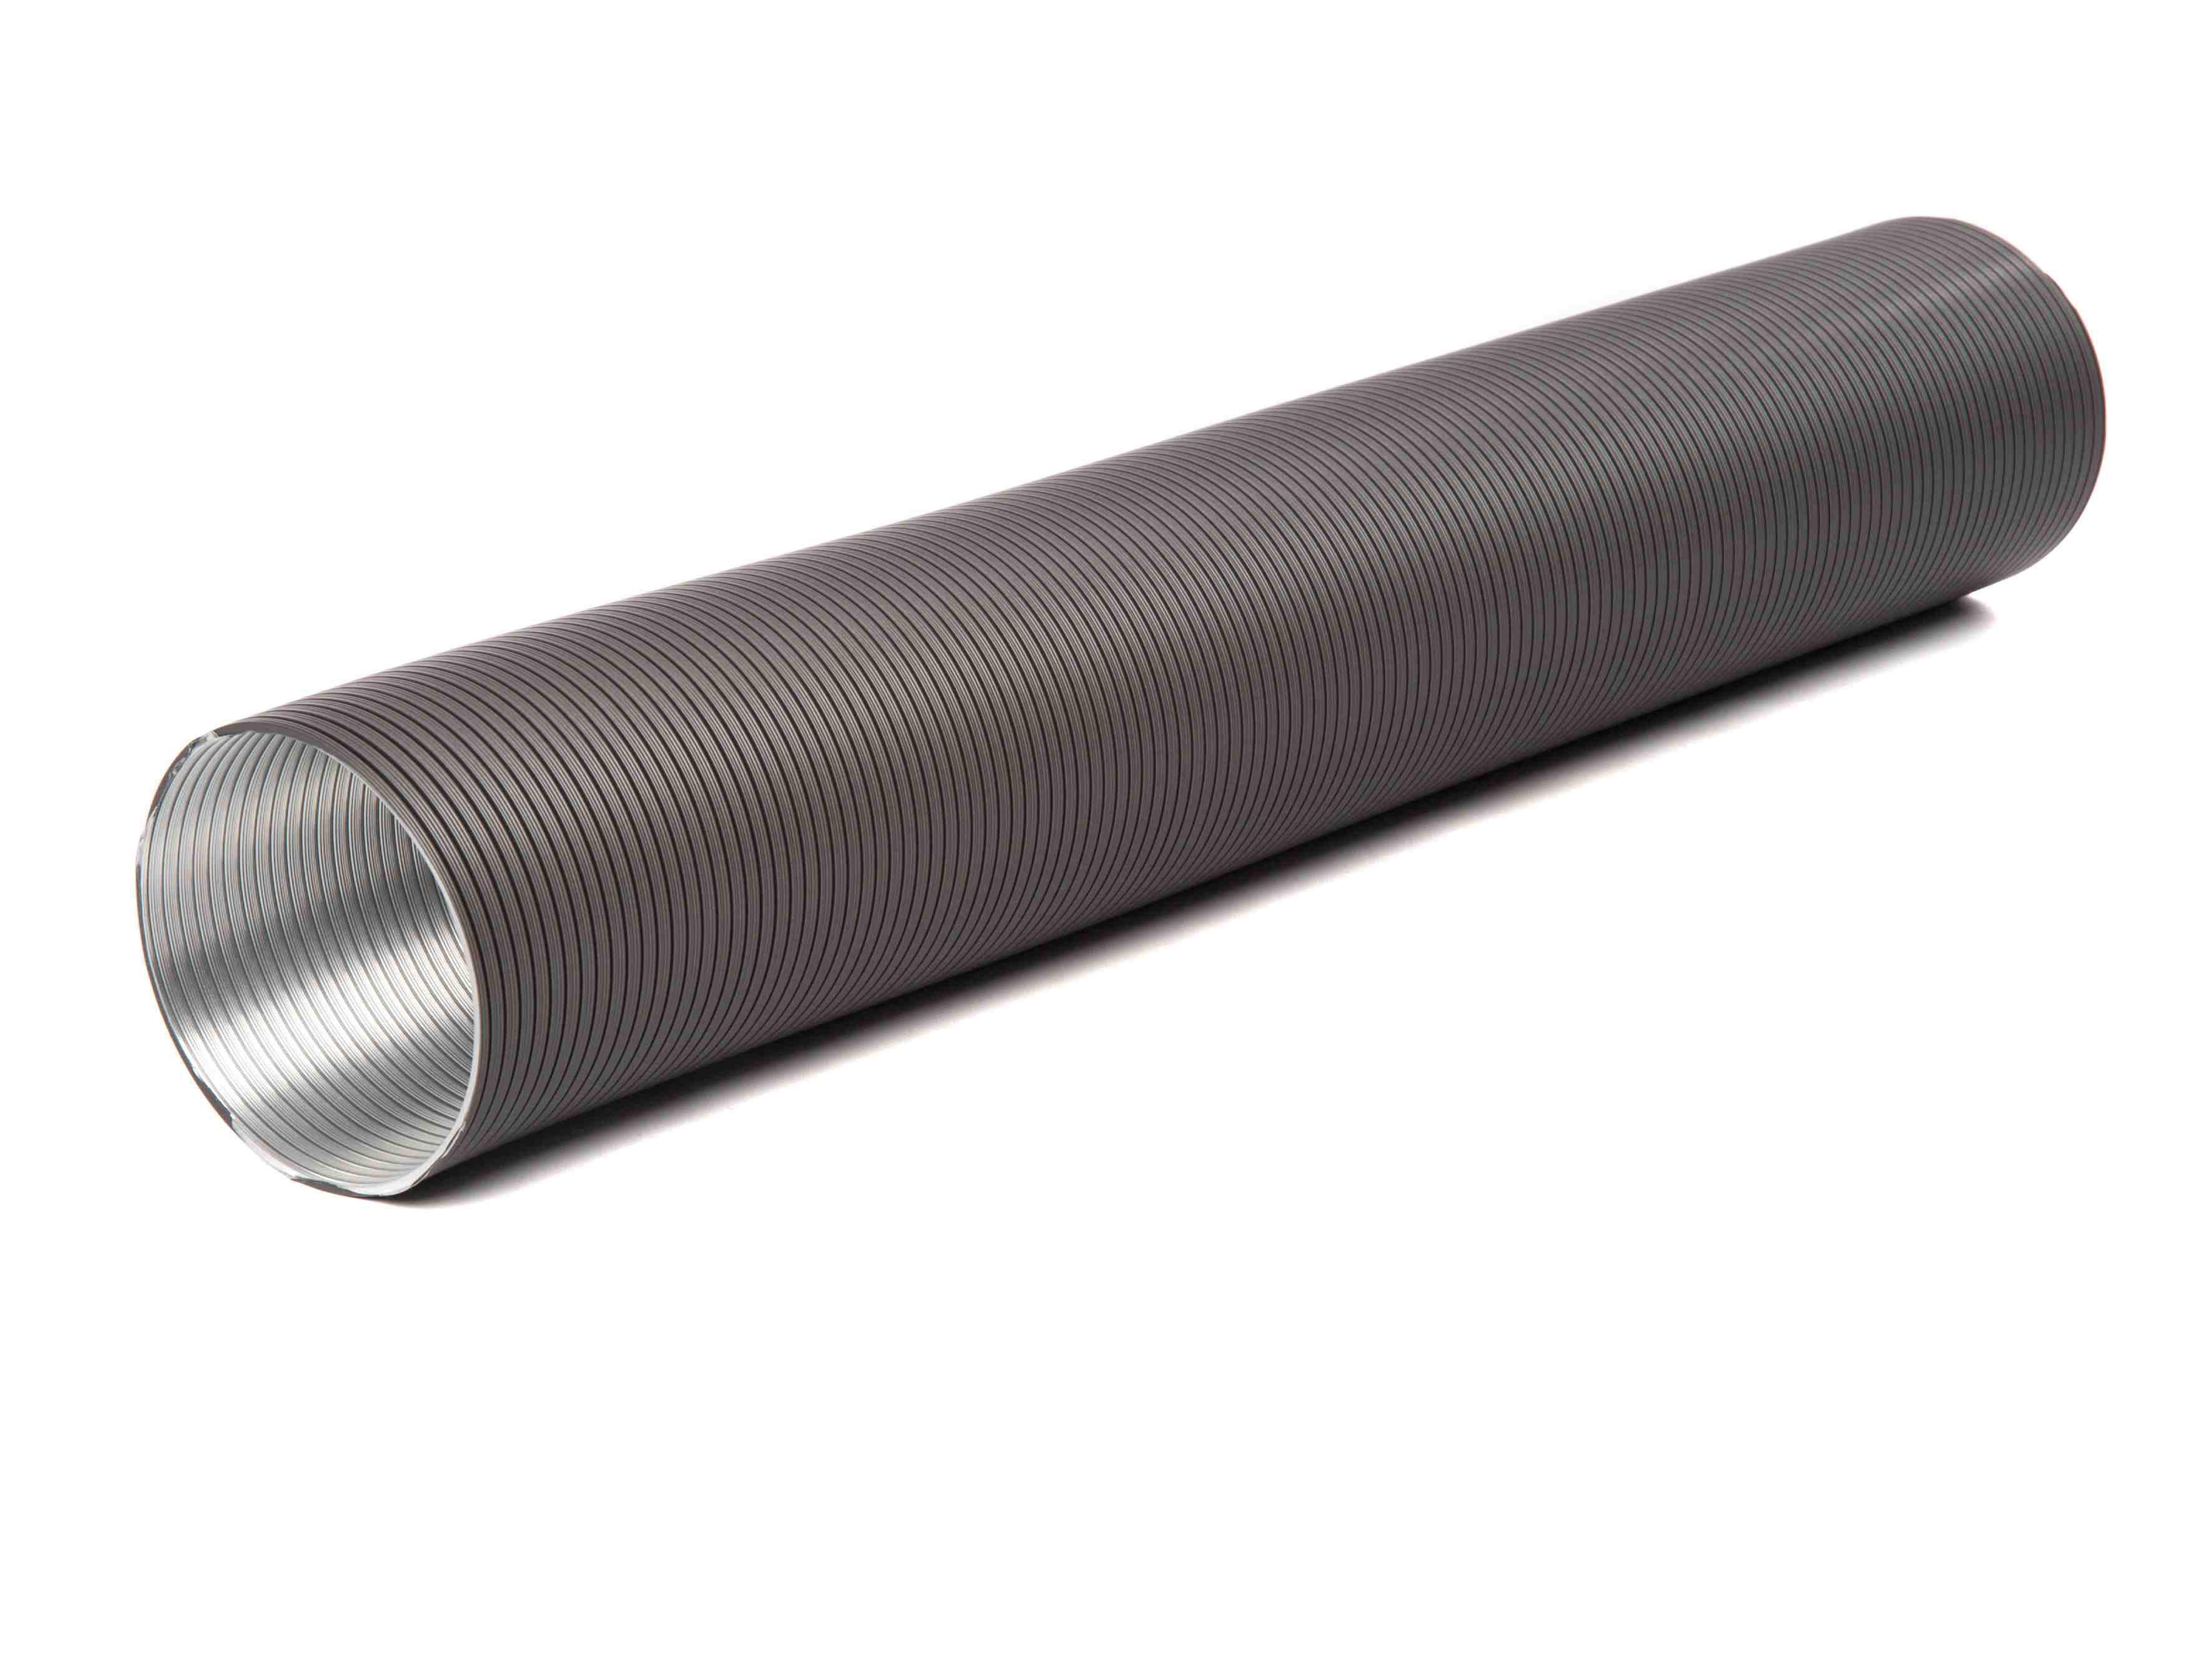 Flexibles Lüftungsrohr aus Aluminium Ø125mm grau Bild 1